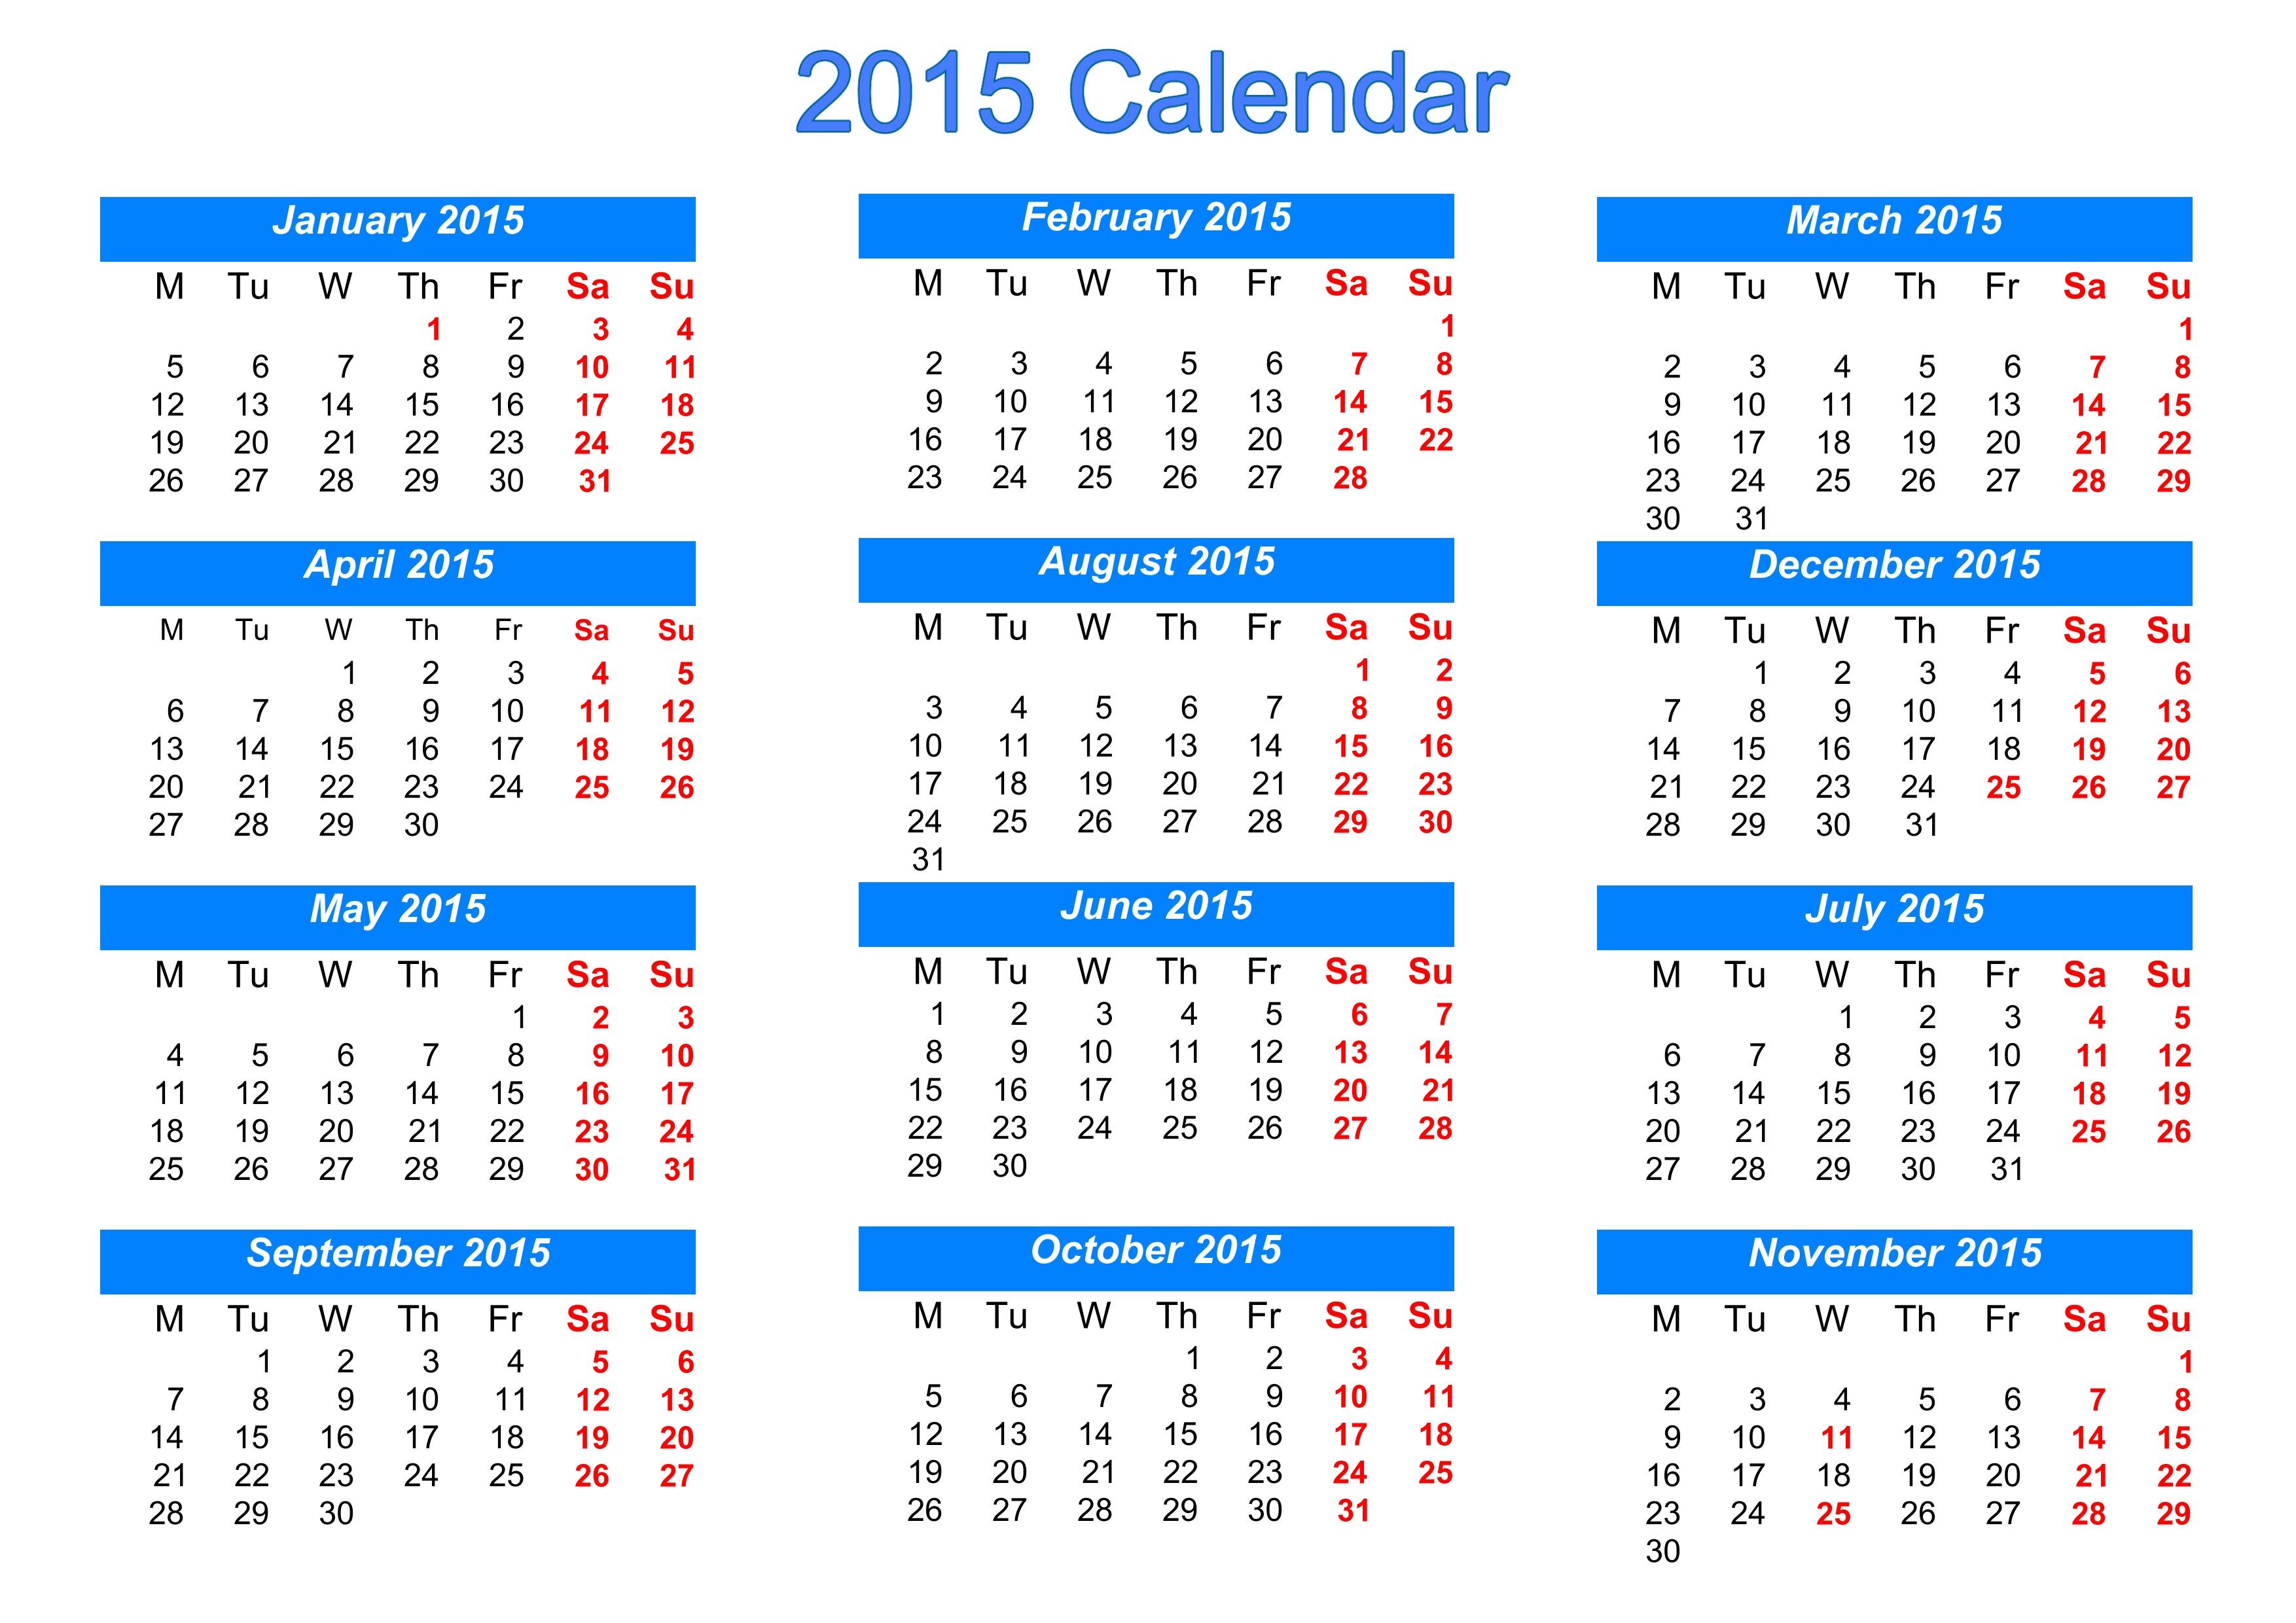 Blank Horizontal Calendar Template | Free Calendar Download inside December 2015 Calendar Printable